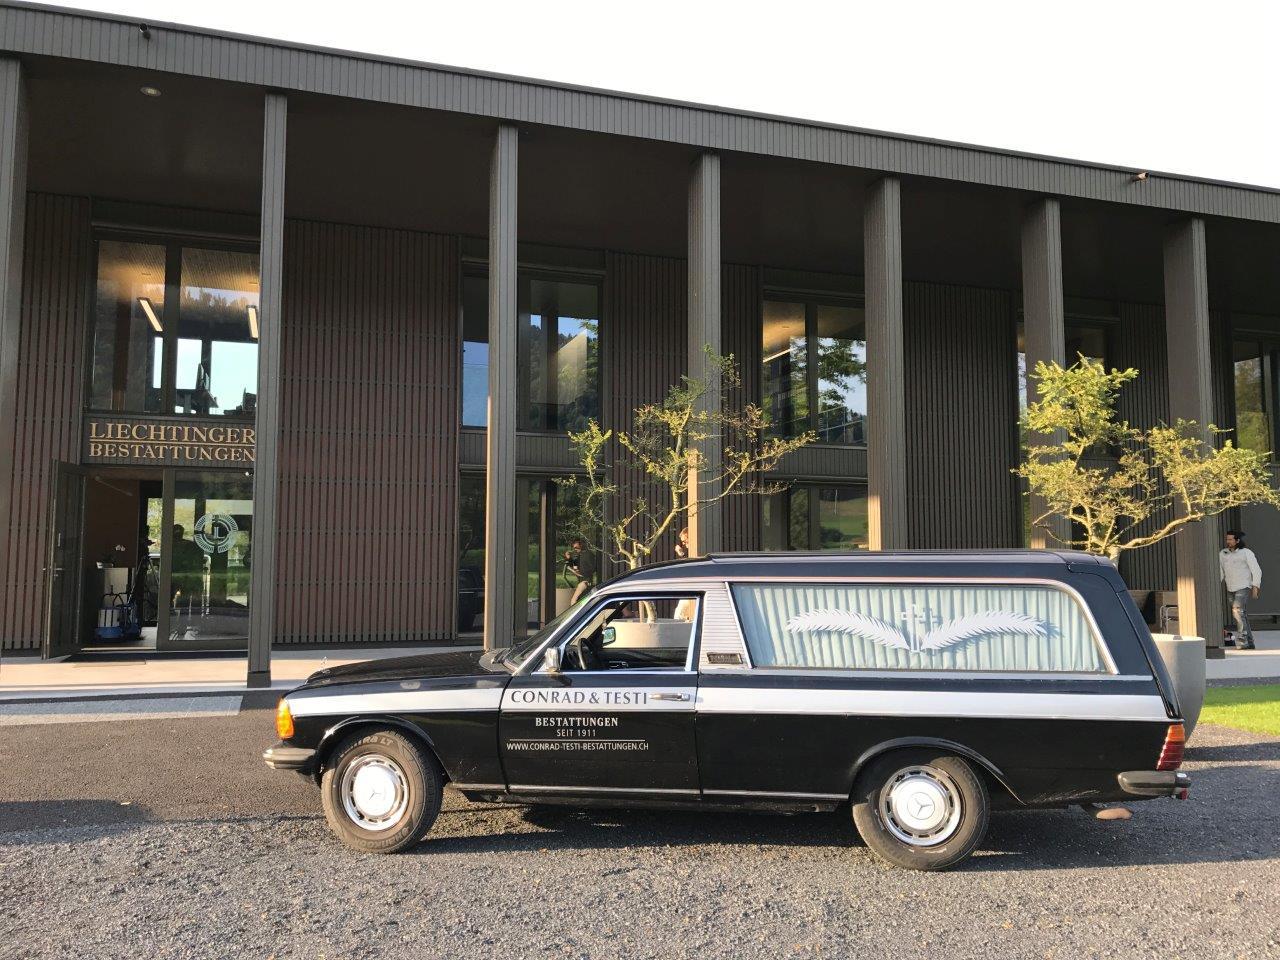 Der Bestatter-Wagen hat in Malters parkiert.